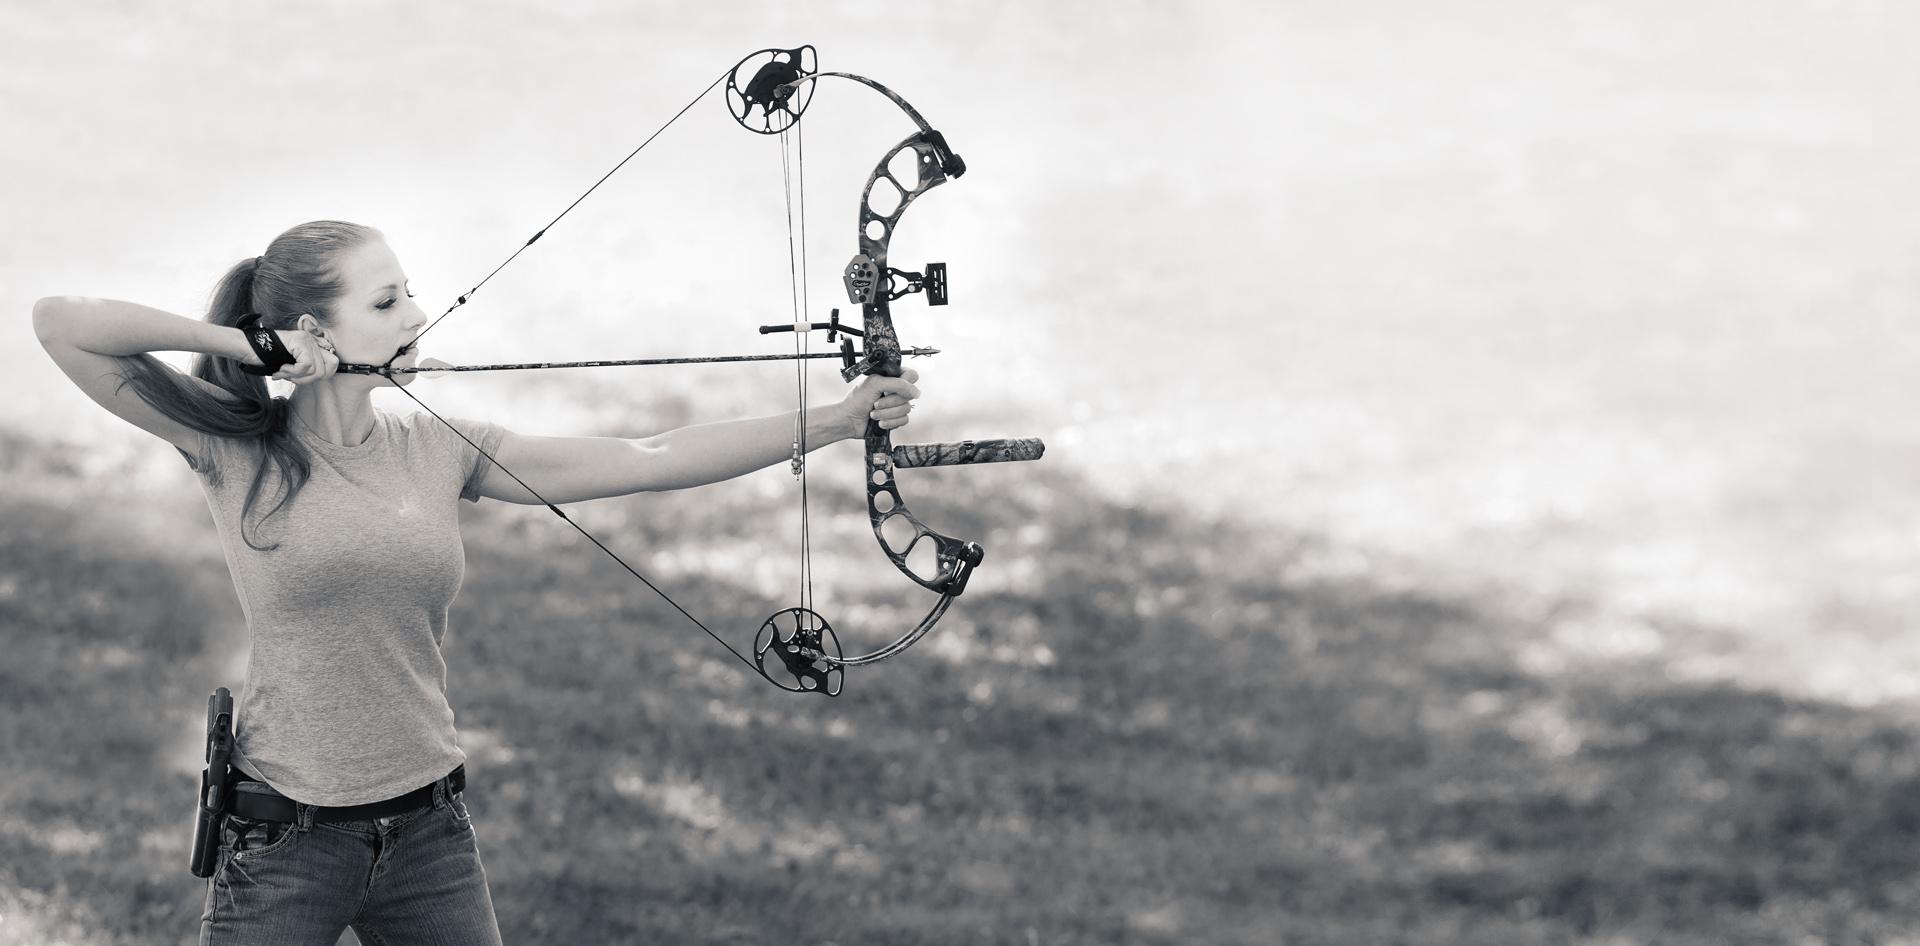 Desktop wallpaper anyone Team Hoyt Archery Wallpaper 1920x946